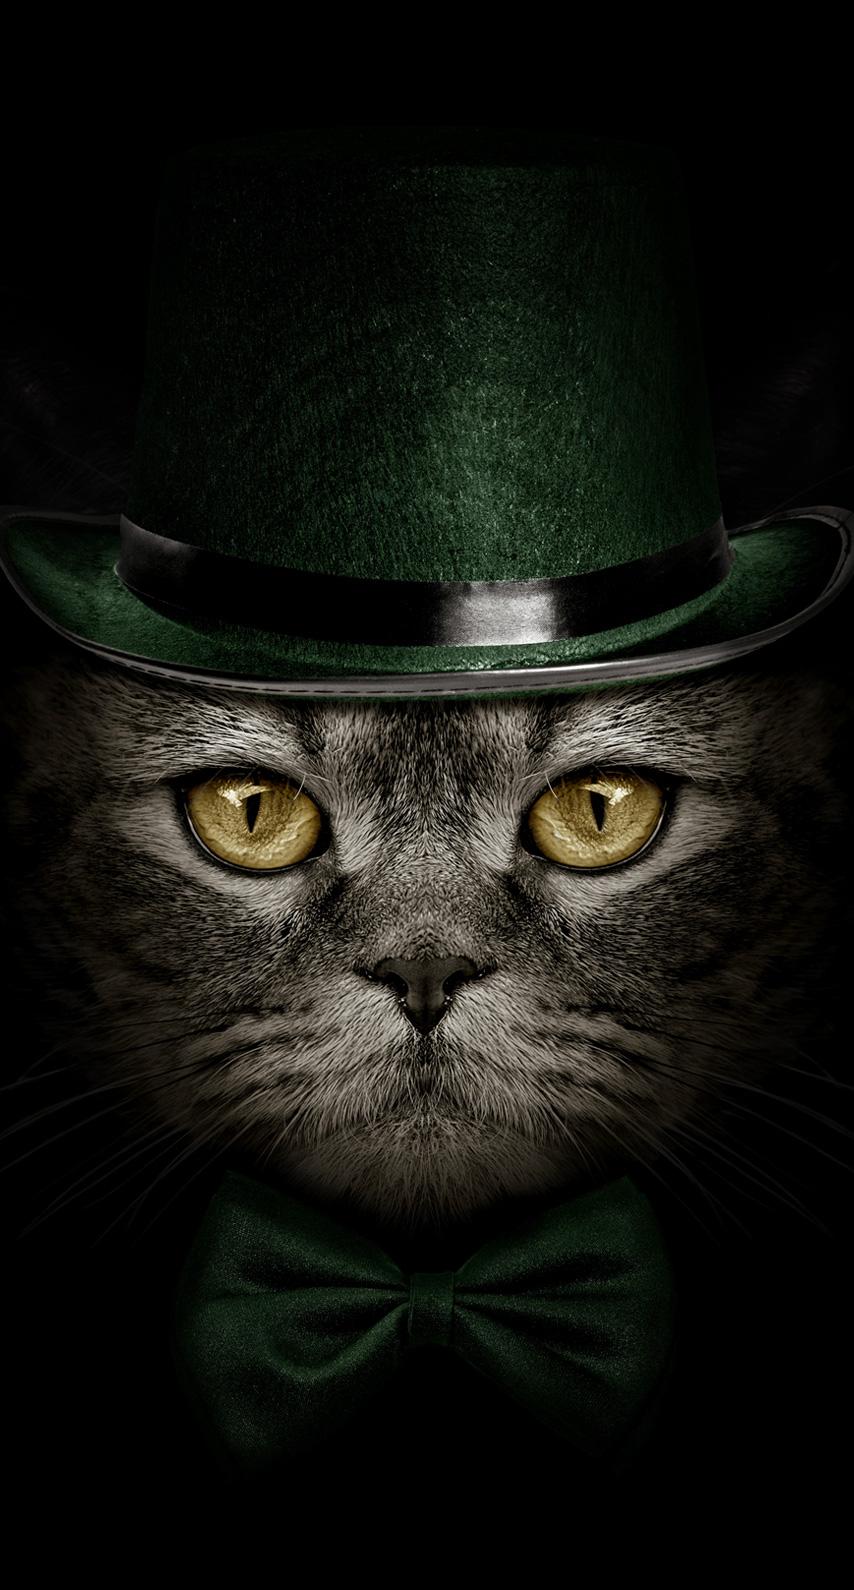 carnivoran, cat like mammal